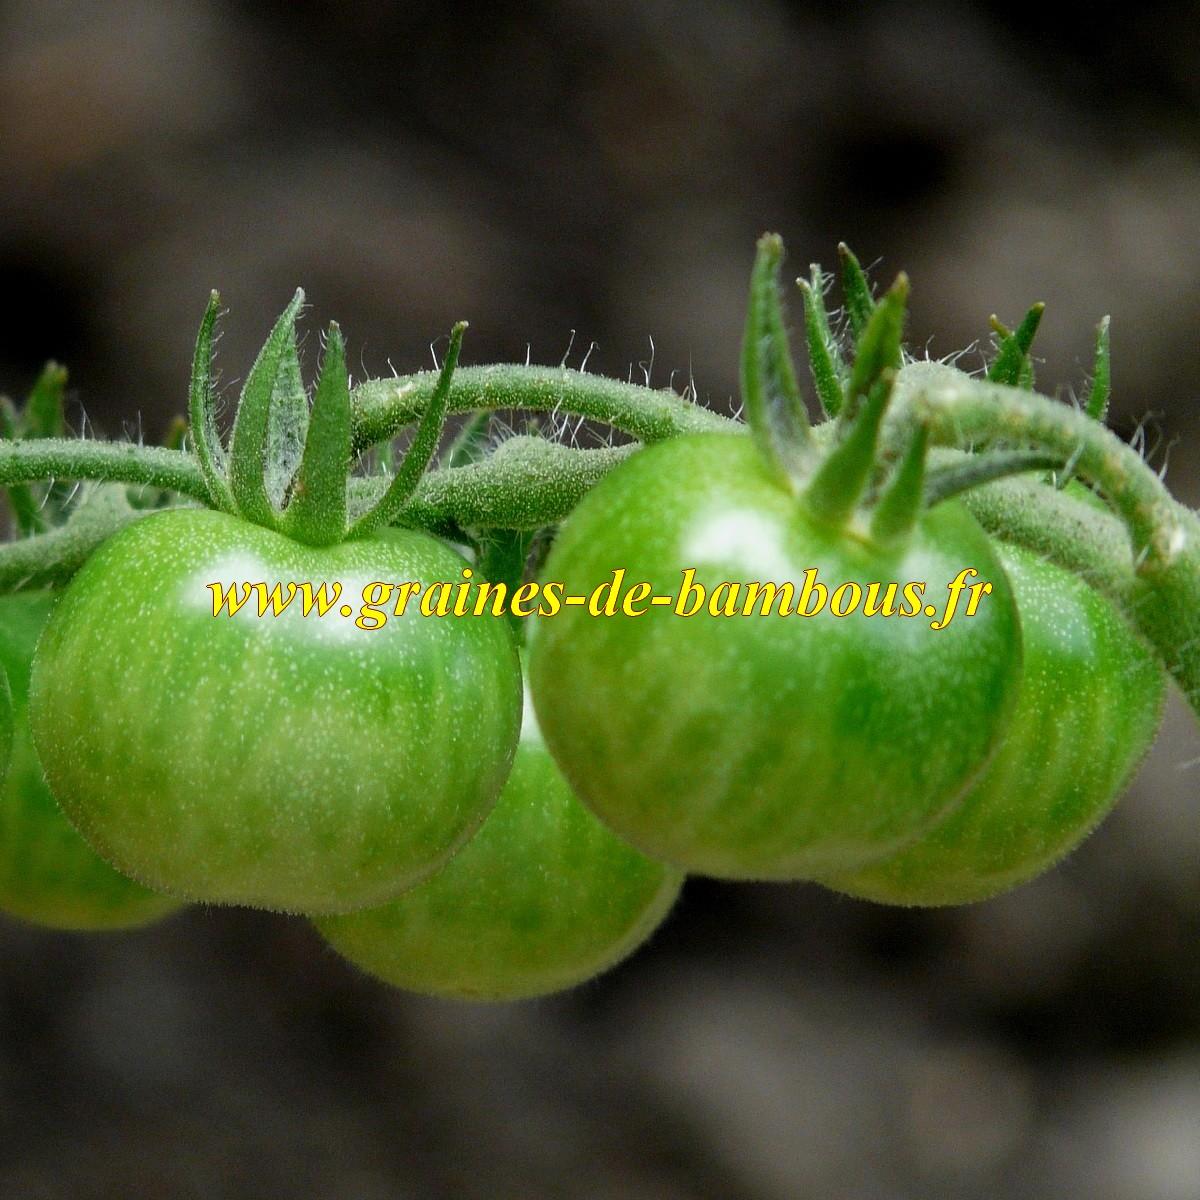 Tomate green grape cerise graines